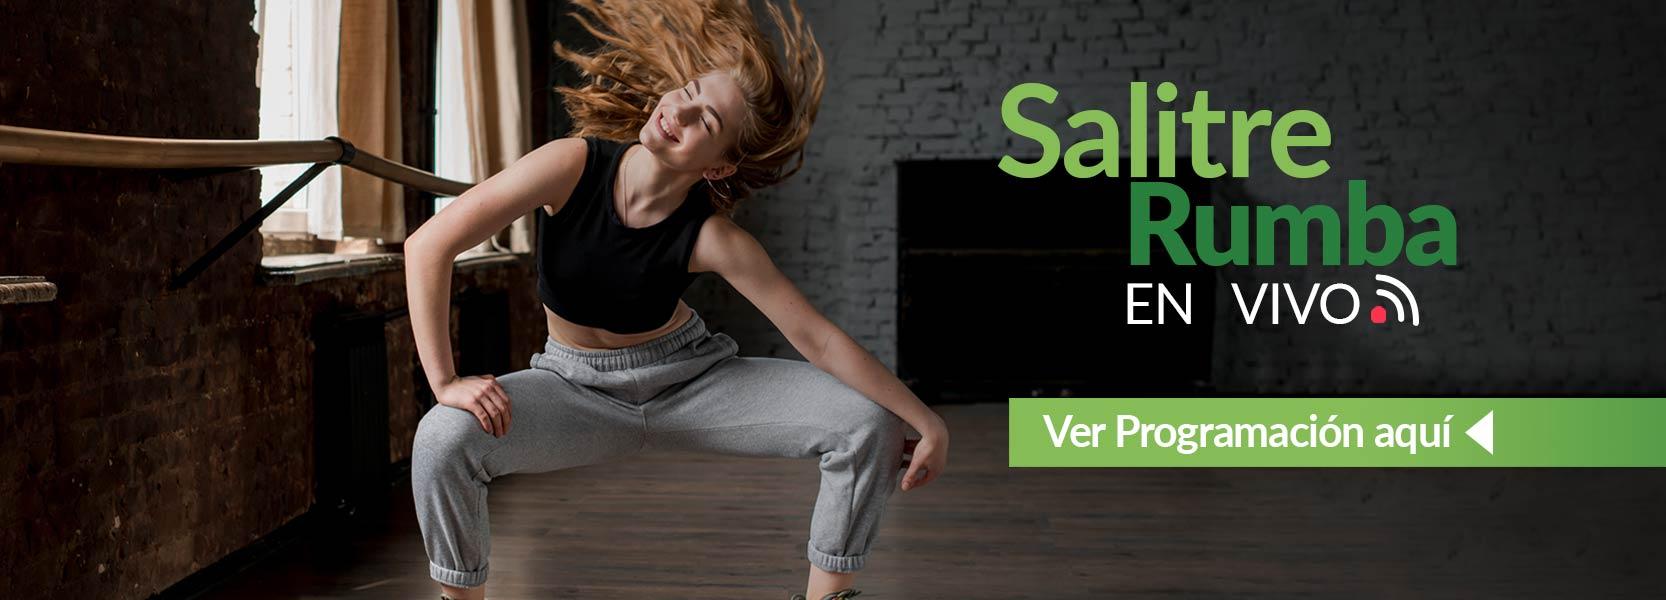 Salitre-RumbaWEB